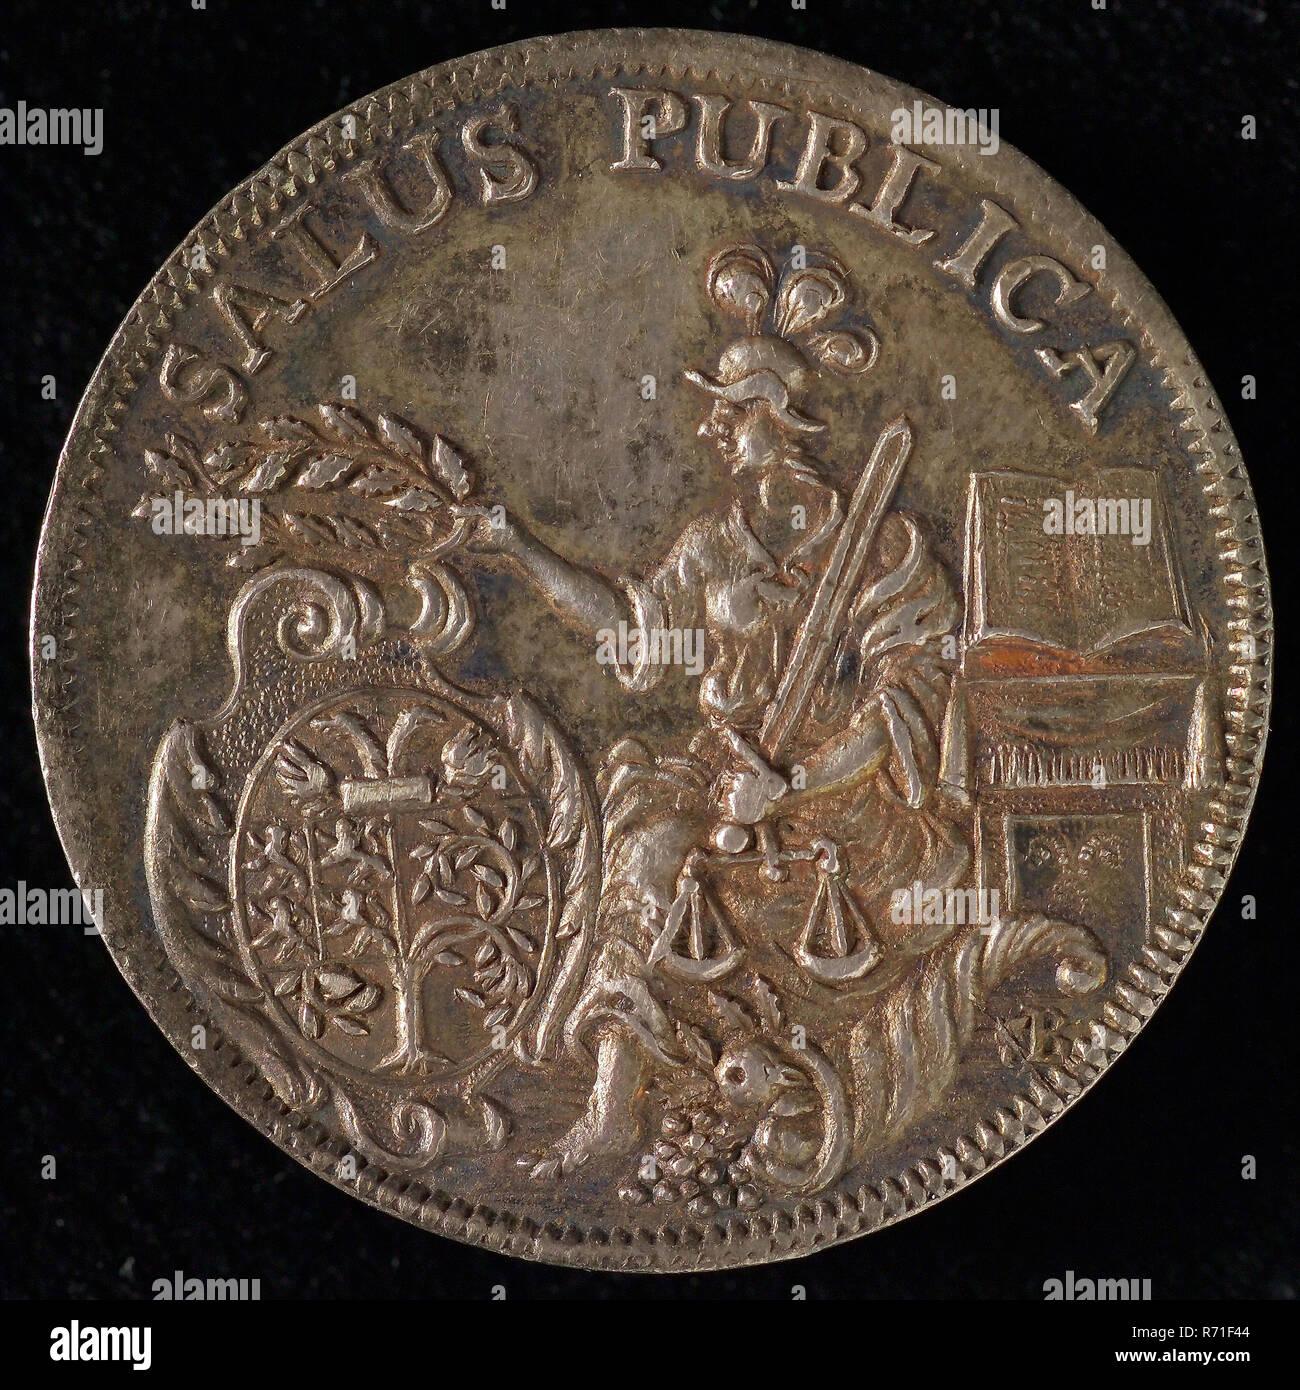 Tooling Medal from Den Bosch, tool penny coin identification